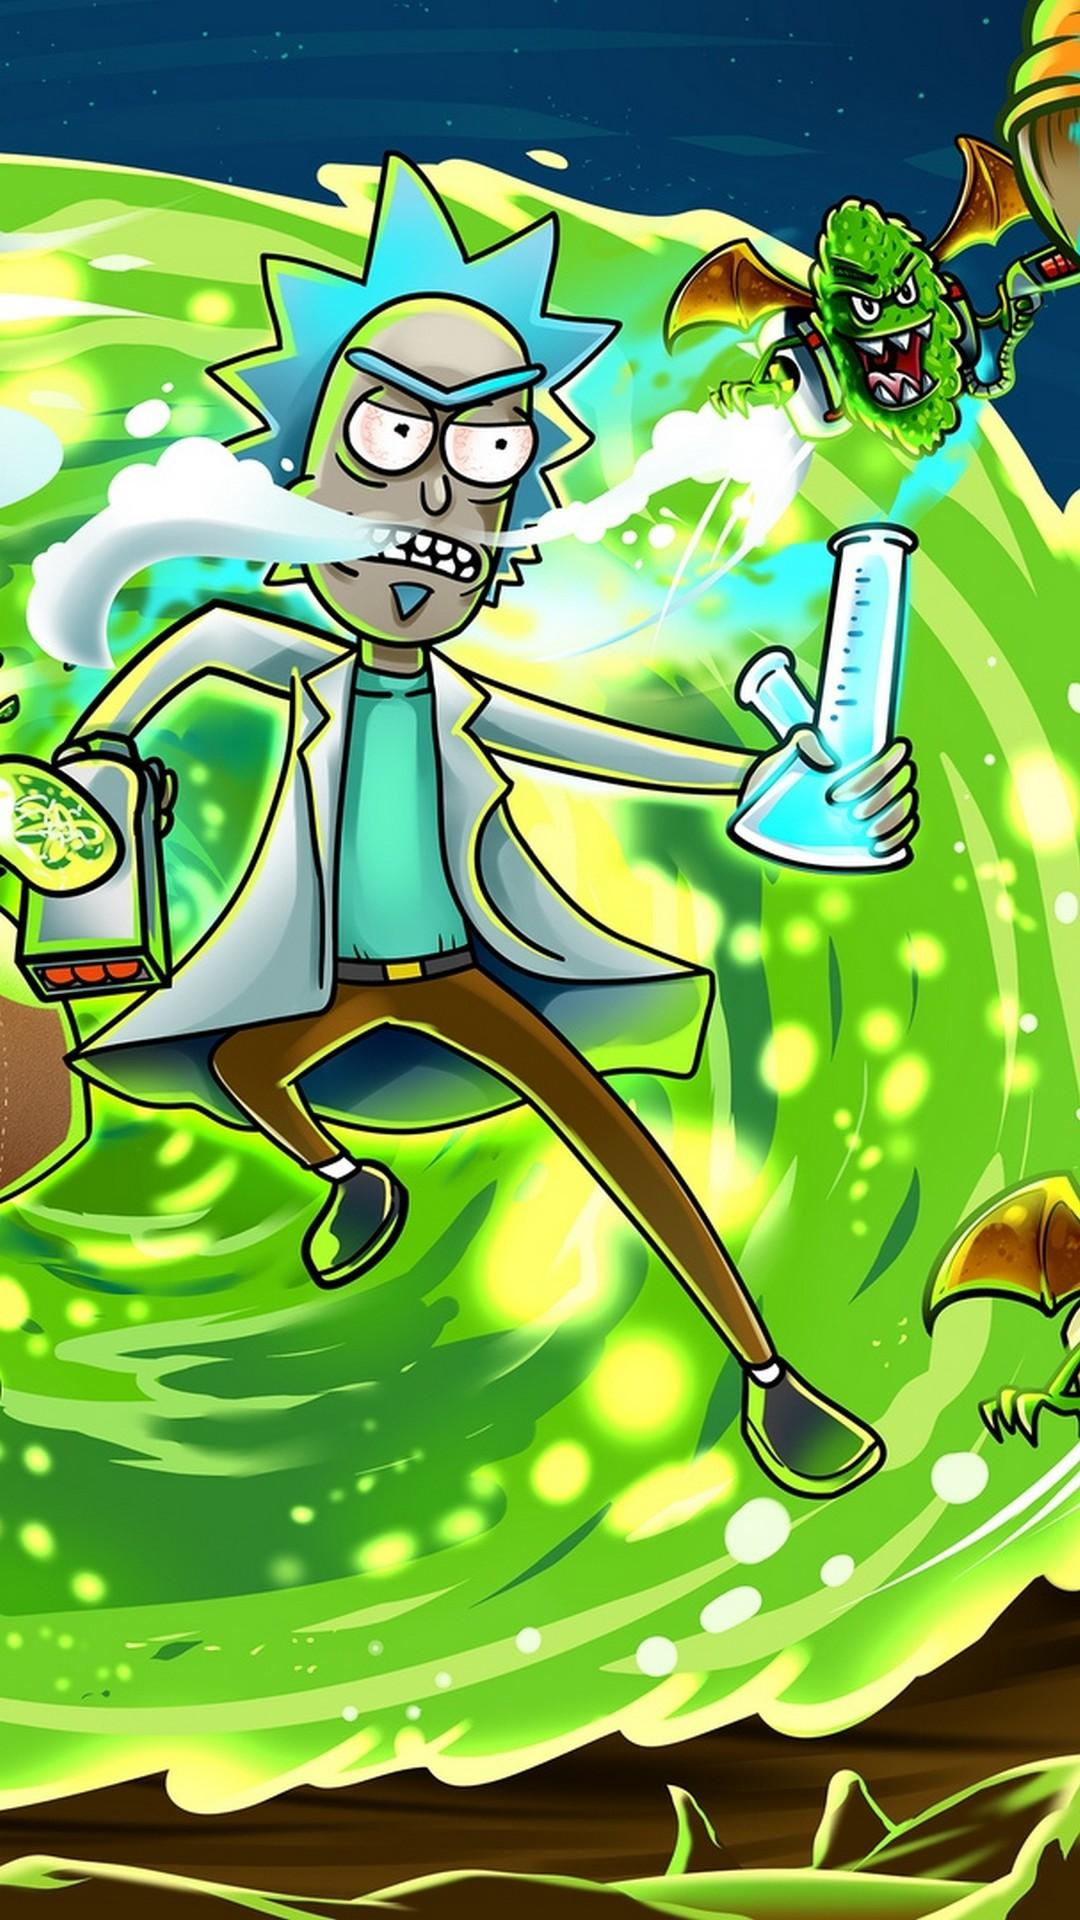 Supreme Rick And Morty Wallpapers Top Free Supreme Rick And